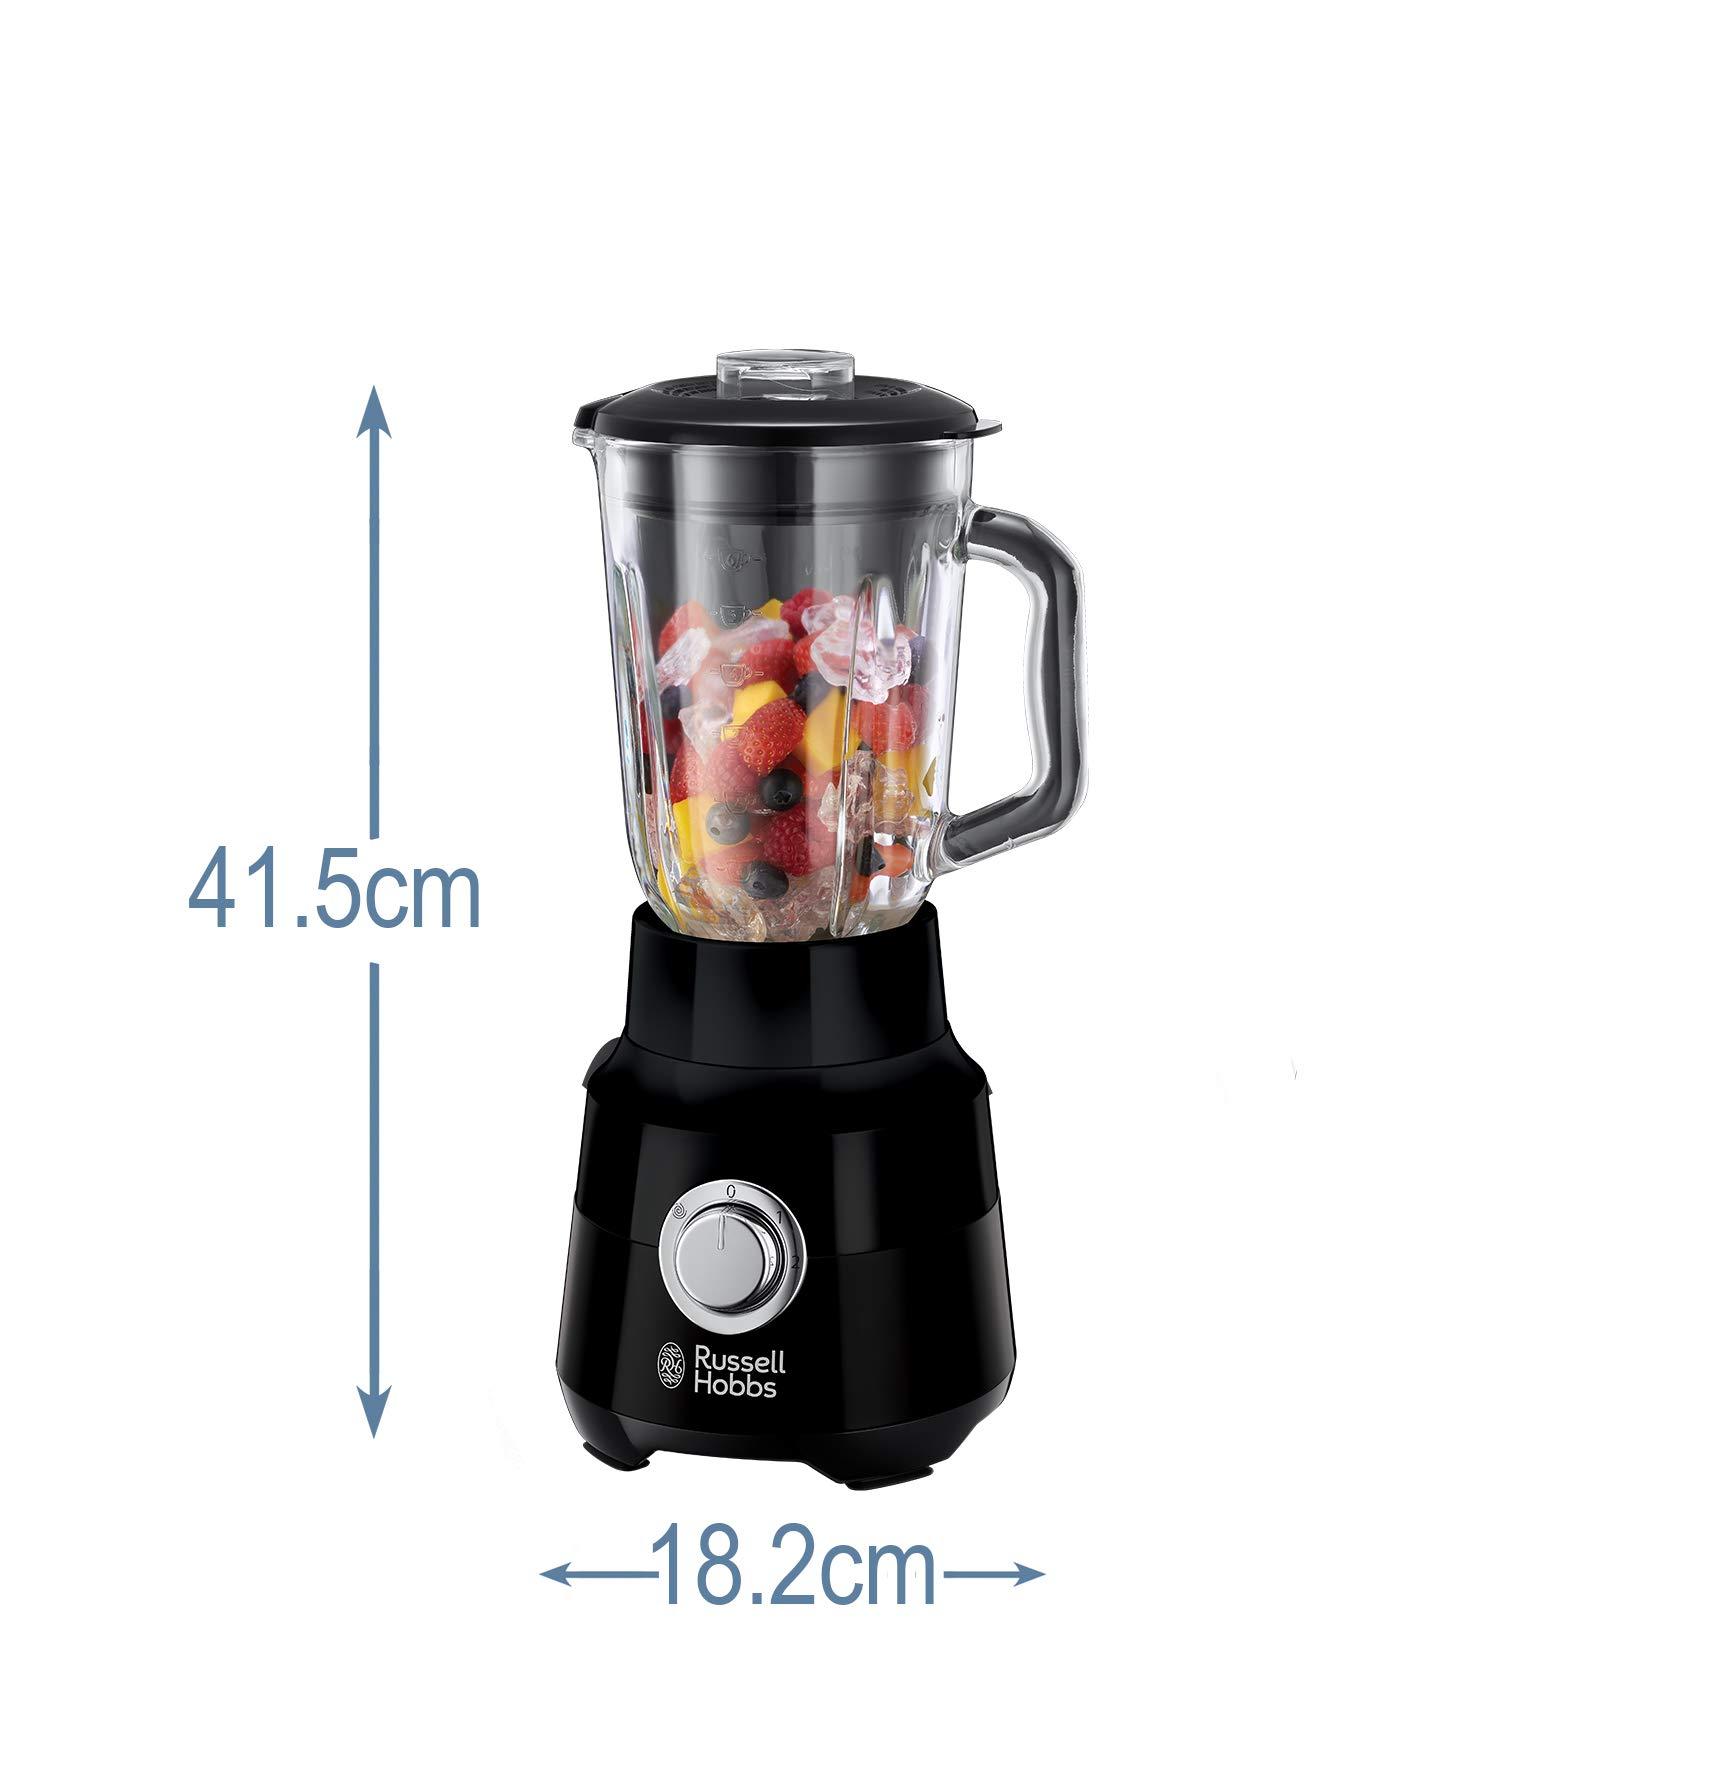 Russell Hobbs 24722 Desire Jug Blender, 1.5 Litre Smoothie Maker and Soup Liquidiser, Matte Black, 650 W